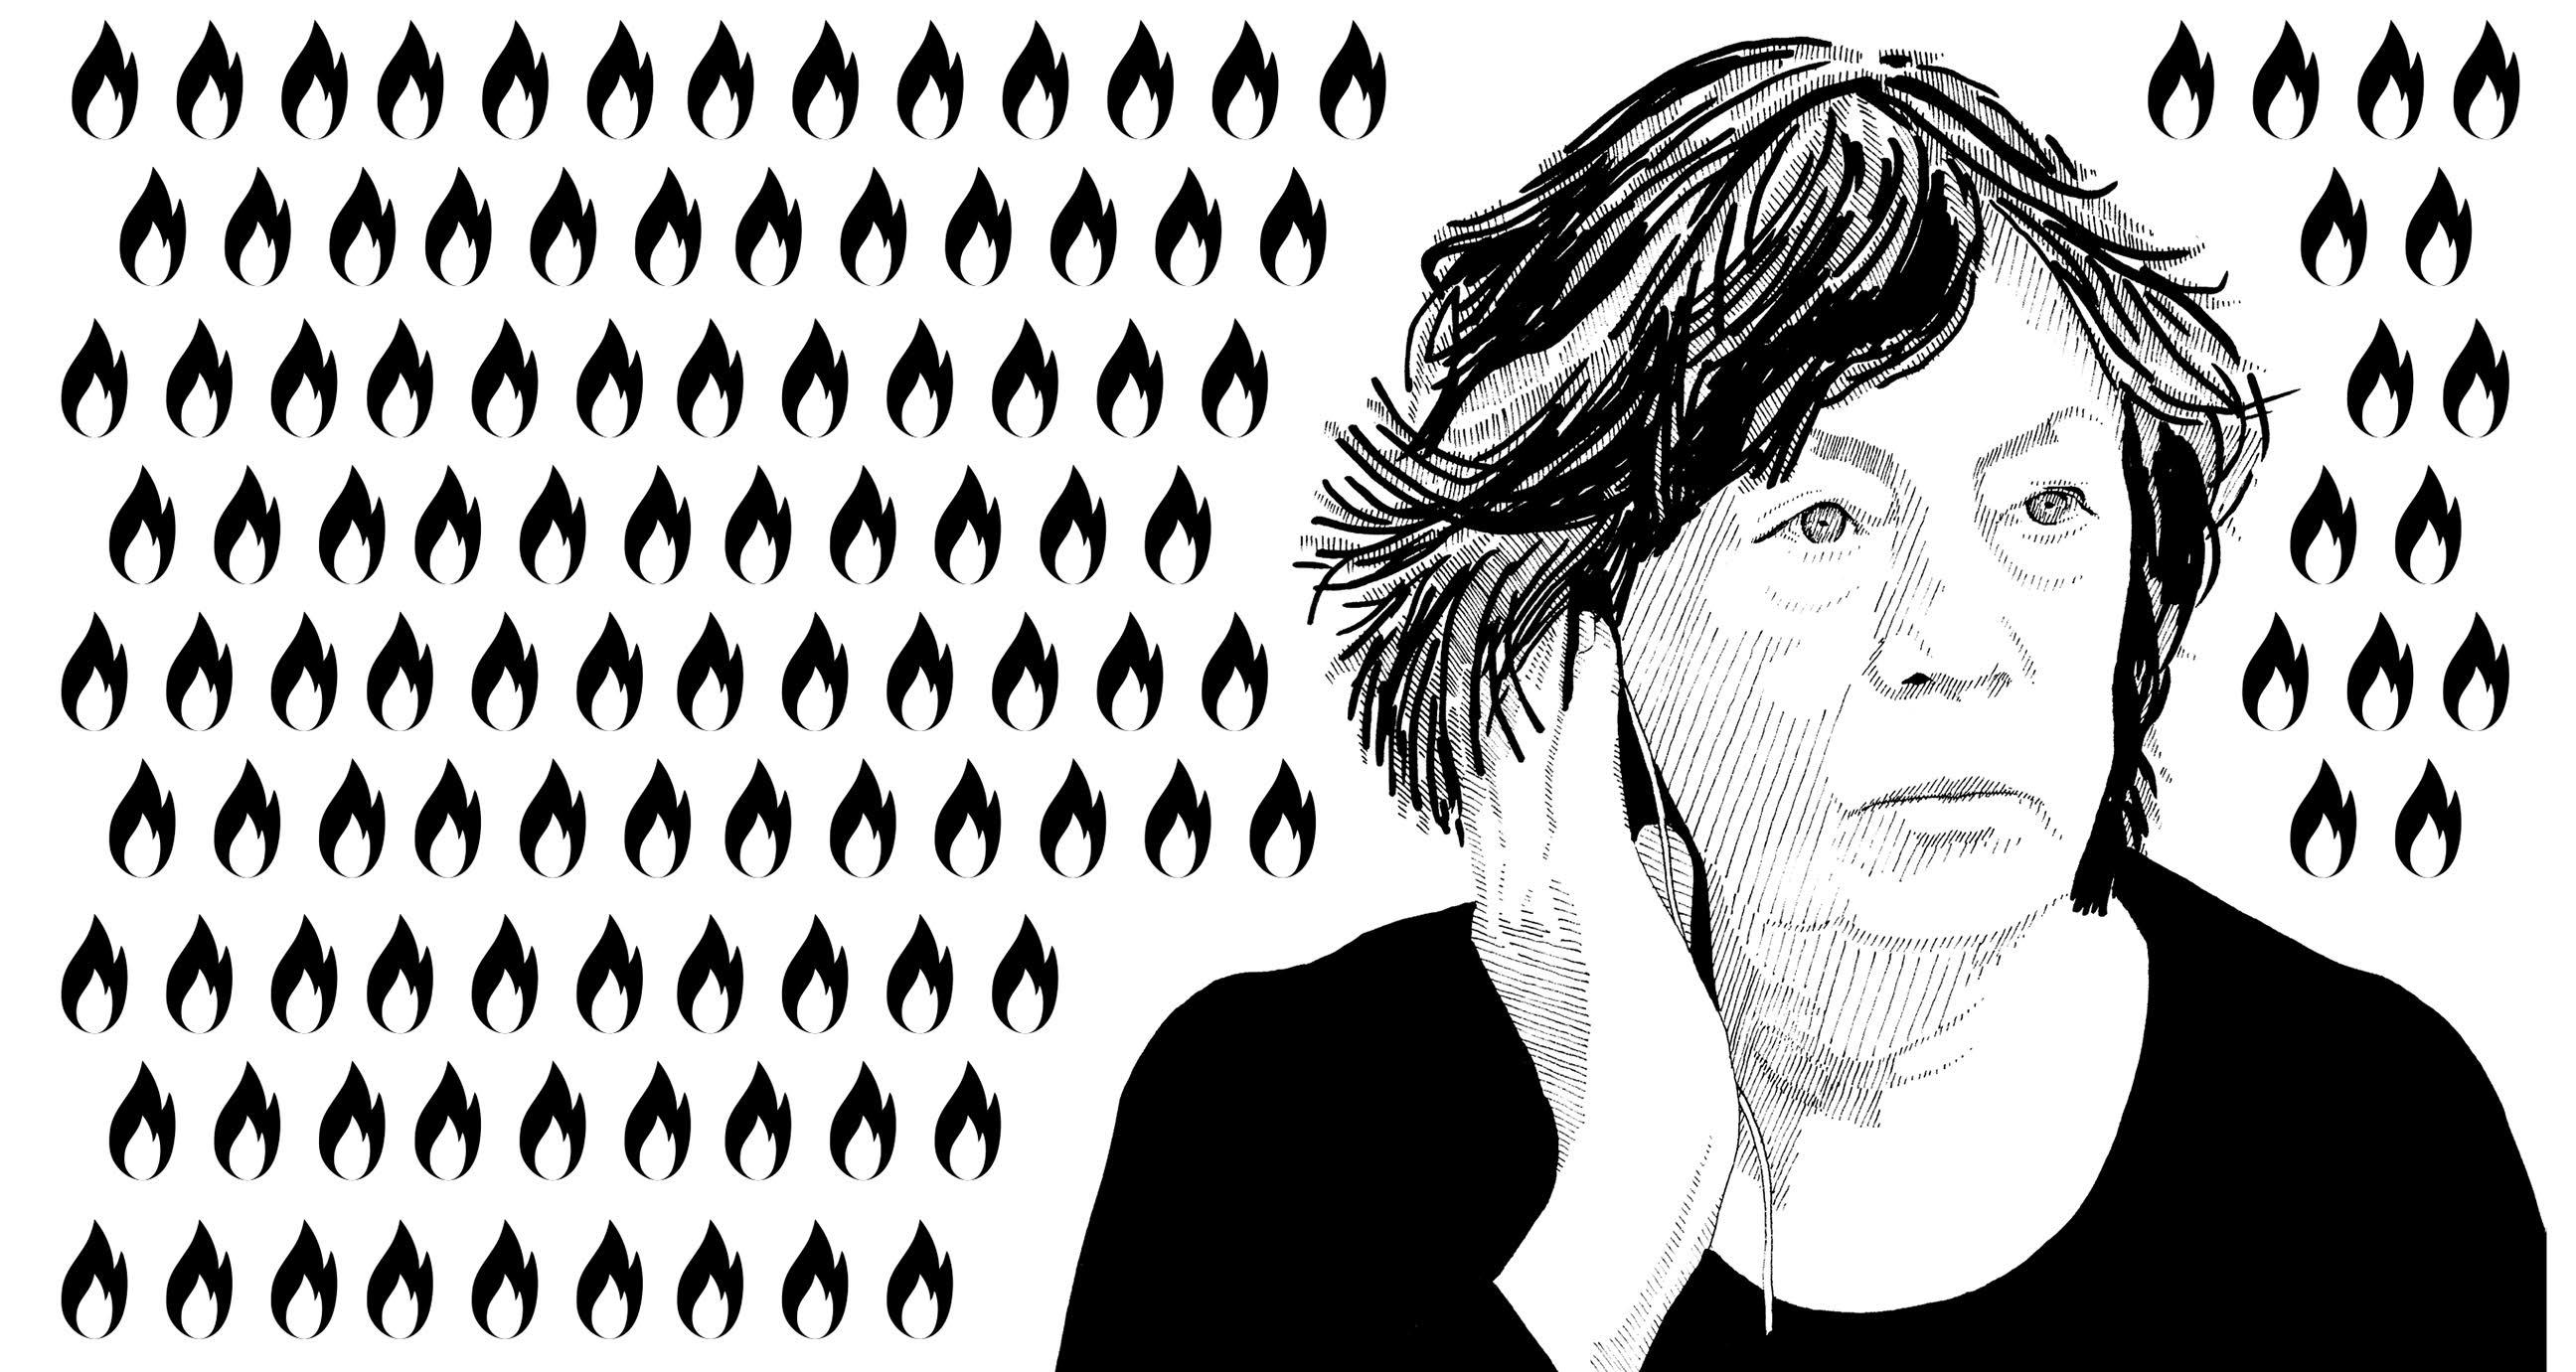 Laura Mulvey illustration